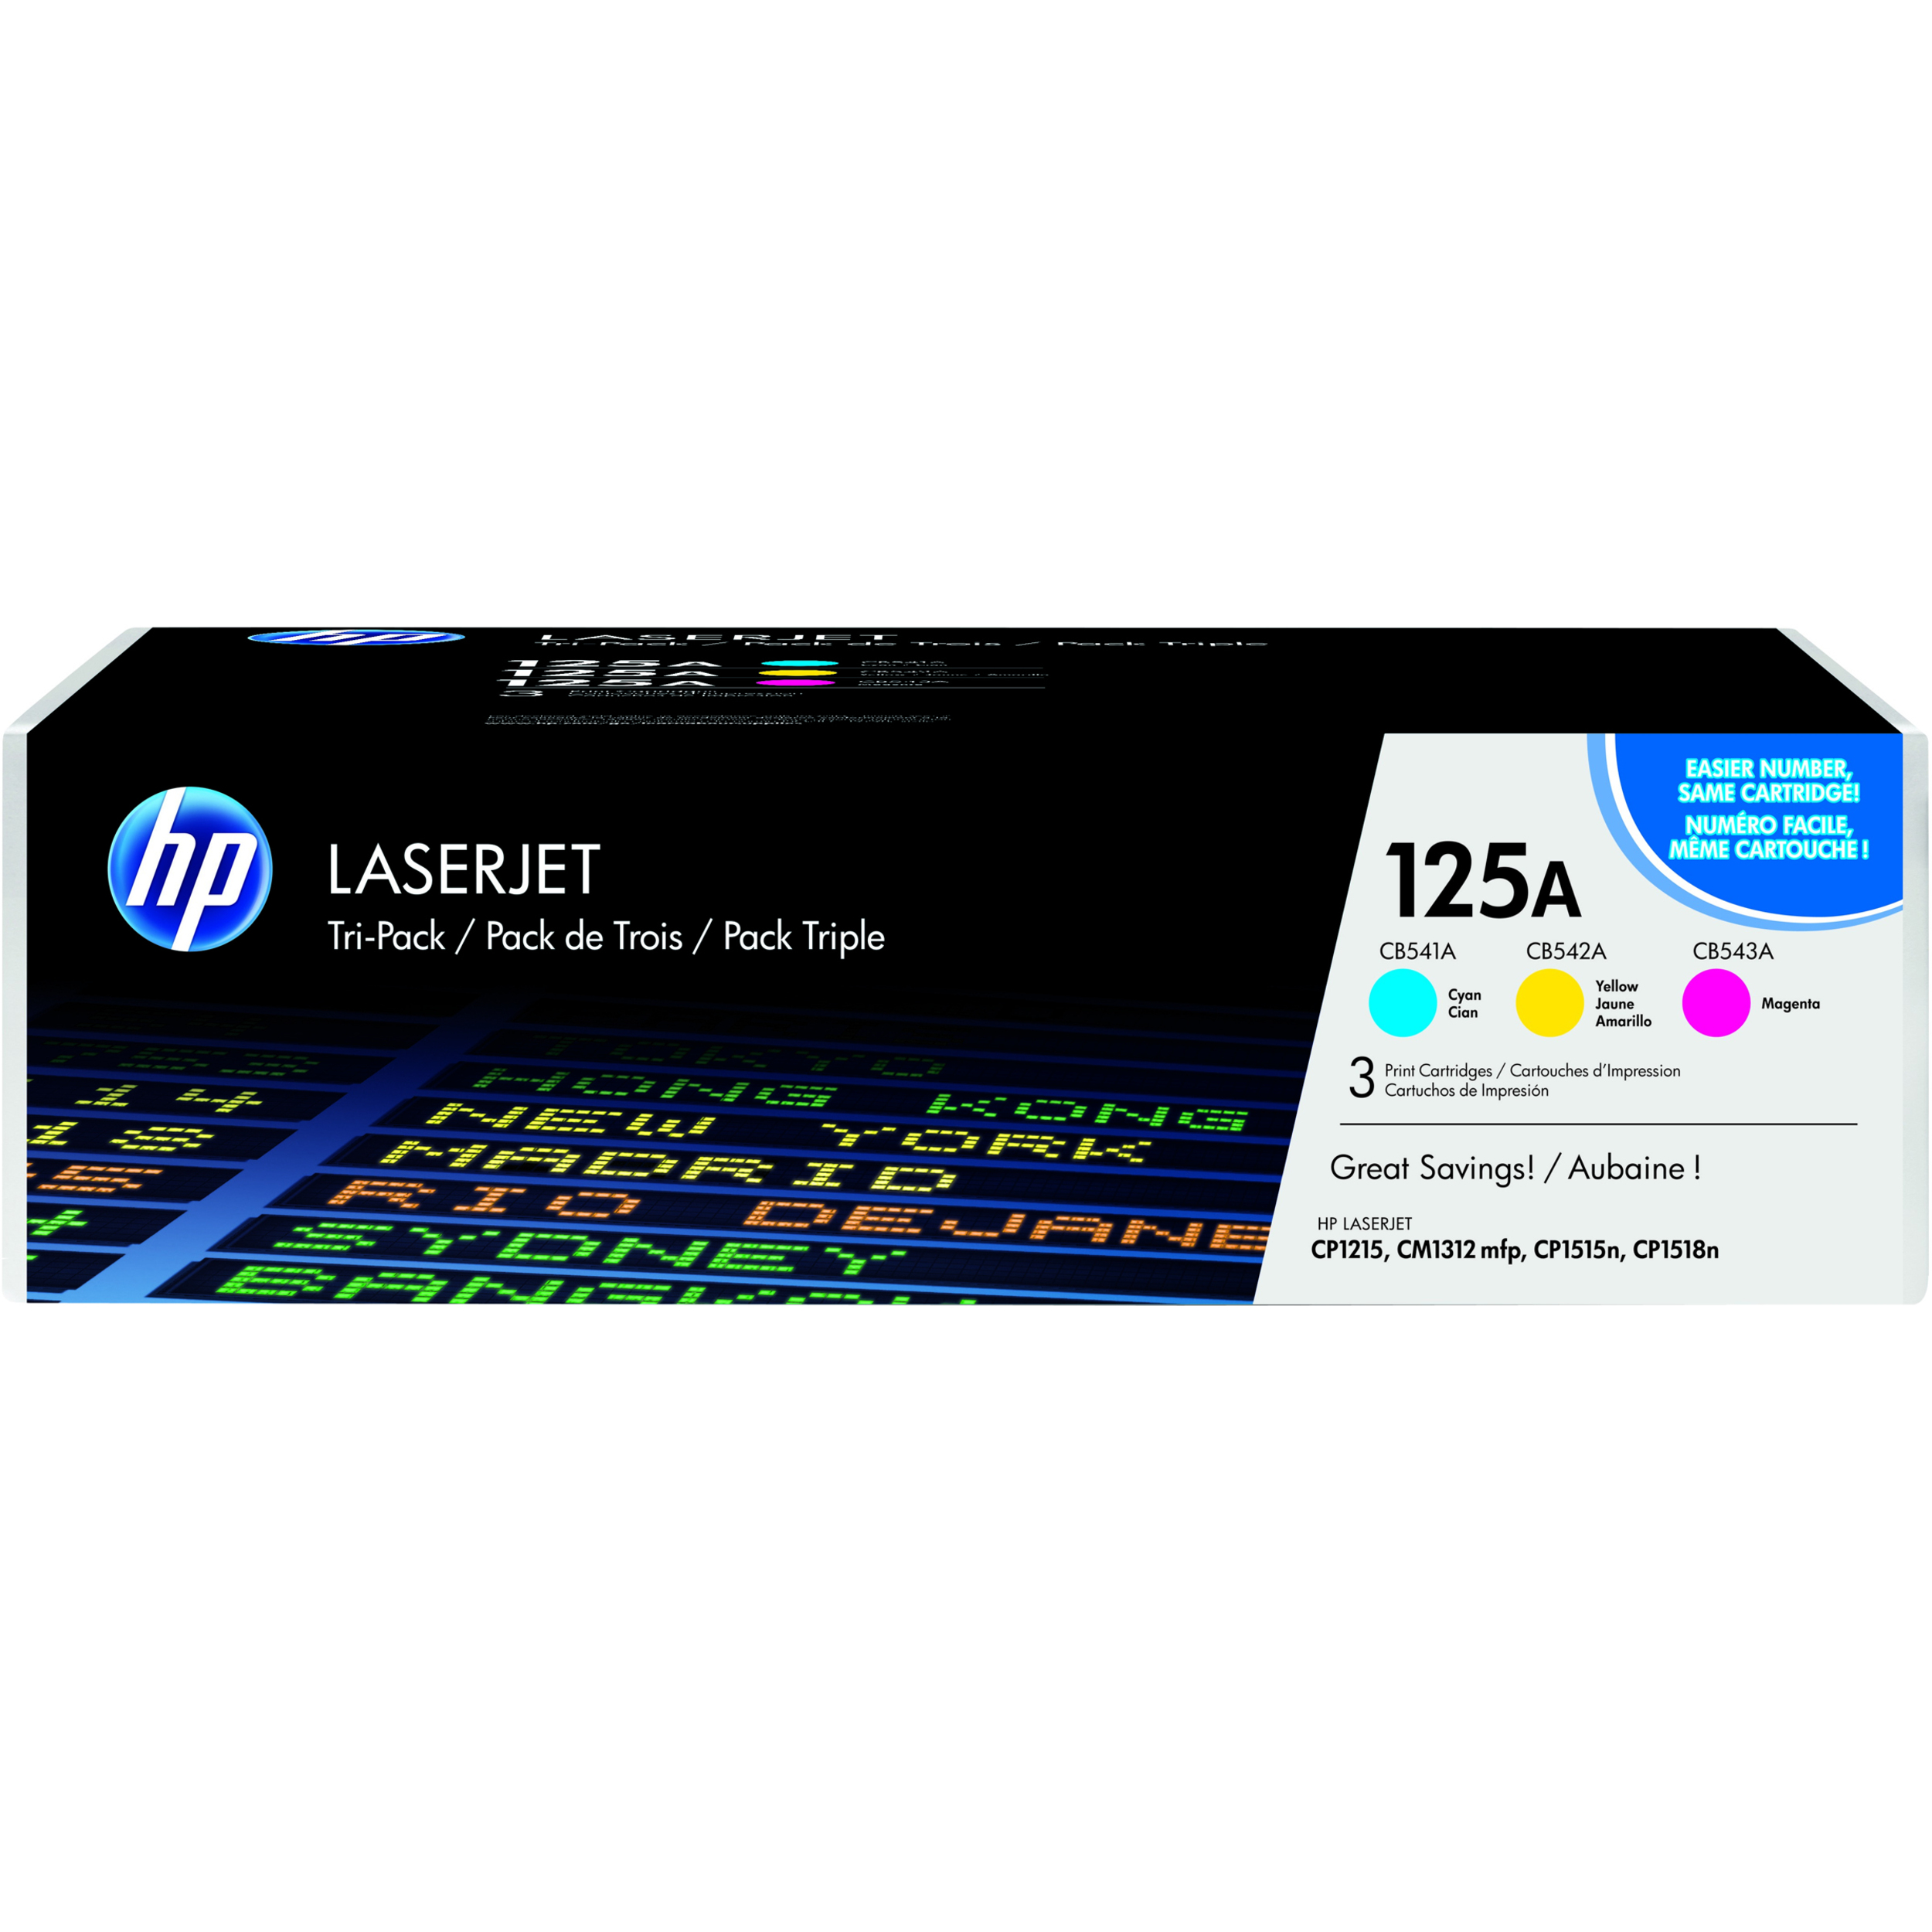 HP 125A Toner Cartridge - Cyan, Yellow, Magenta - Laser - 1400 Page - 3 Pack